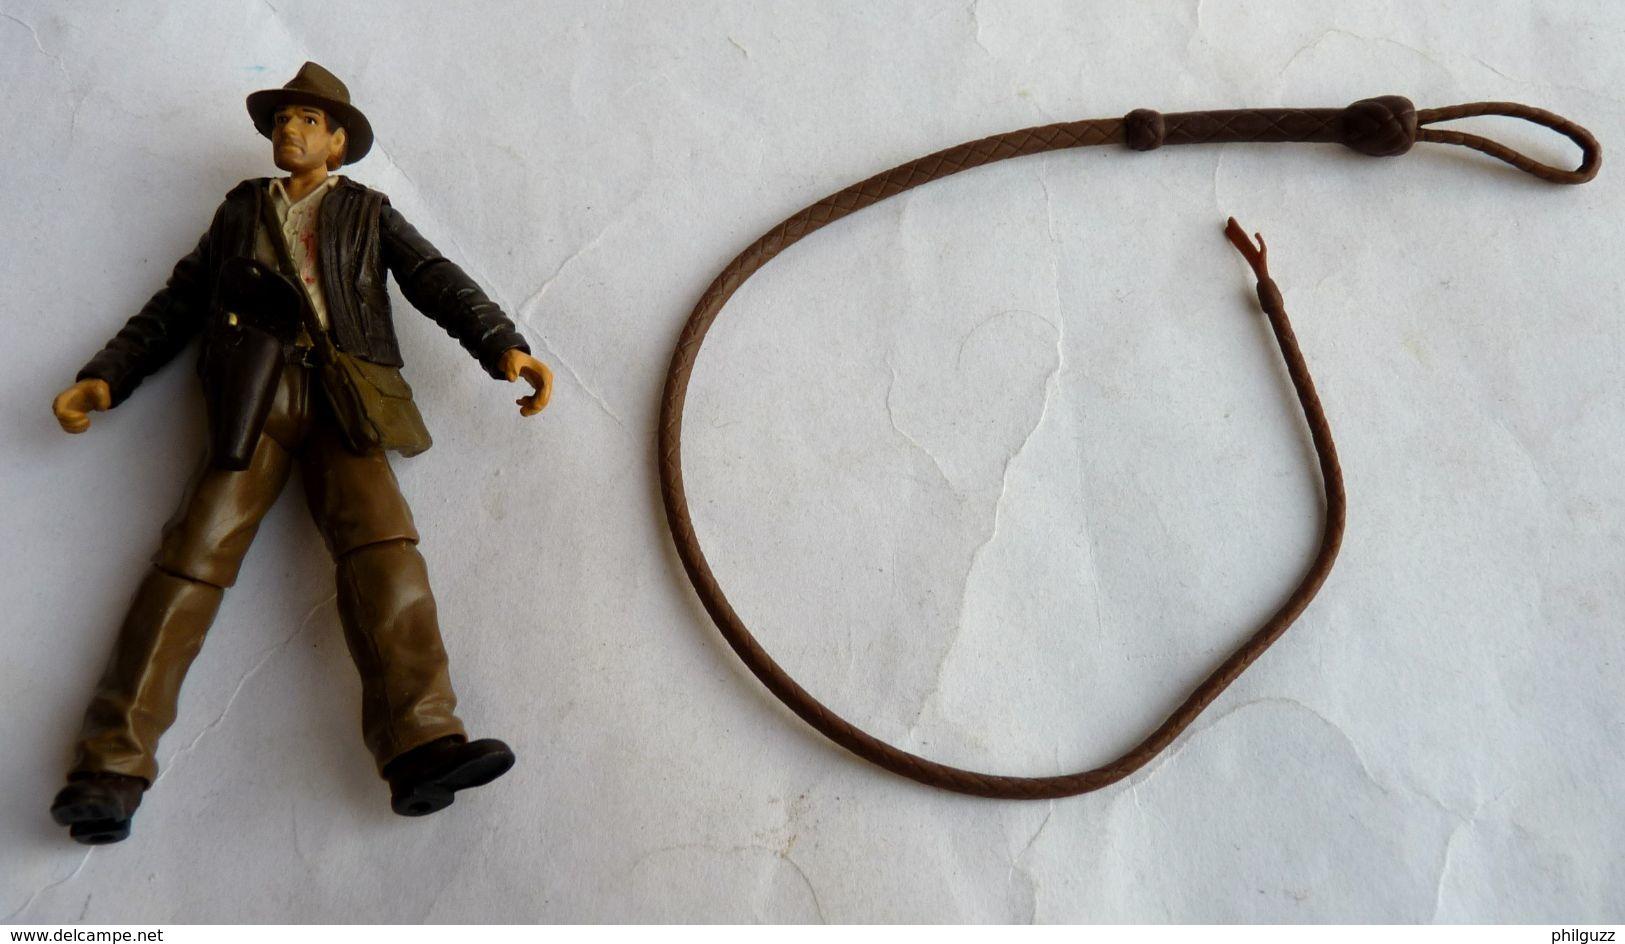 INDIANA JONES - RAIDERS OF THE LOST ARK - HASBRO 2008 - FOUET POUR FIGURINE 12 Pouce - Figurines